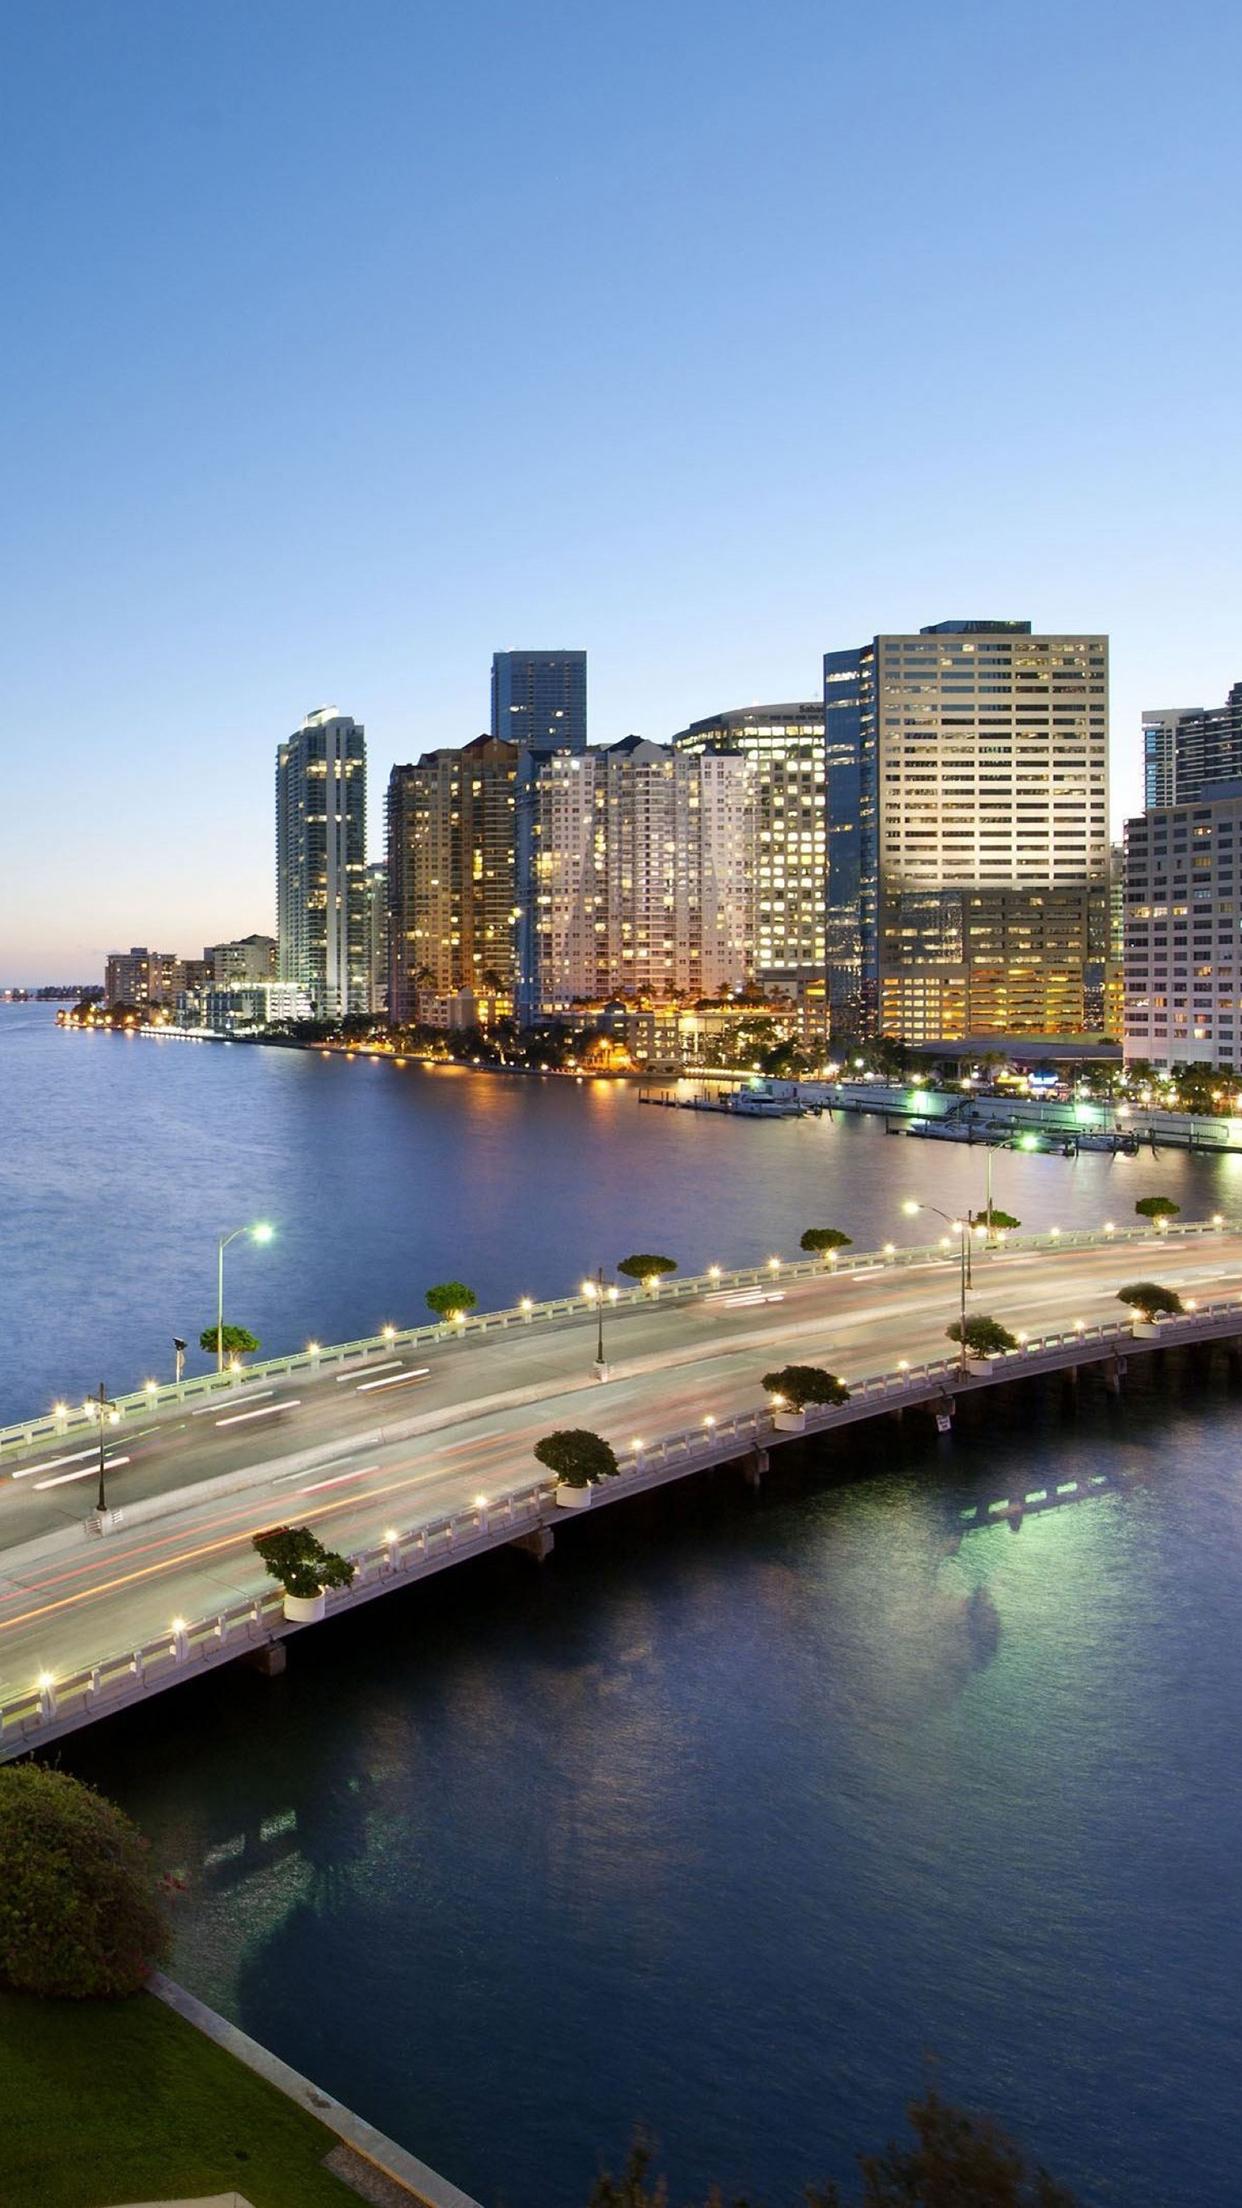 Miami Florida Bridge 3Wallpapers iPhone Parallax Miami Florida : Bridge